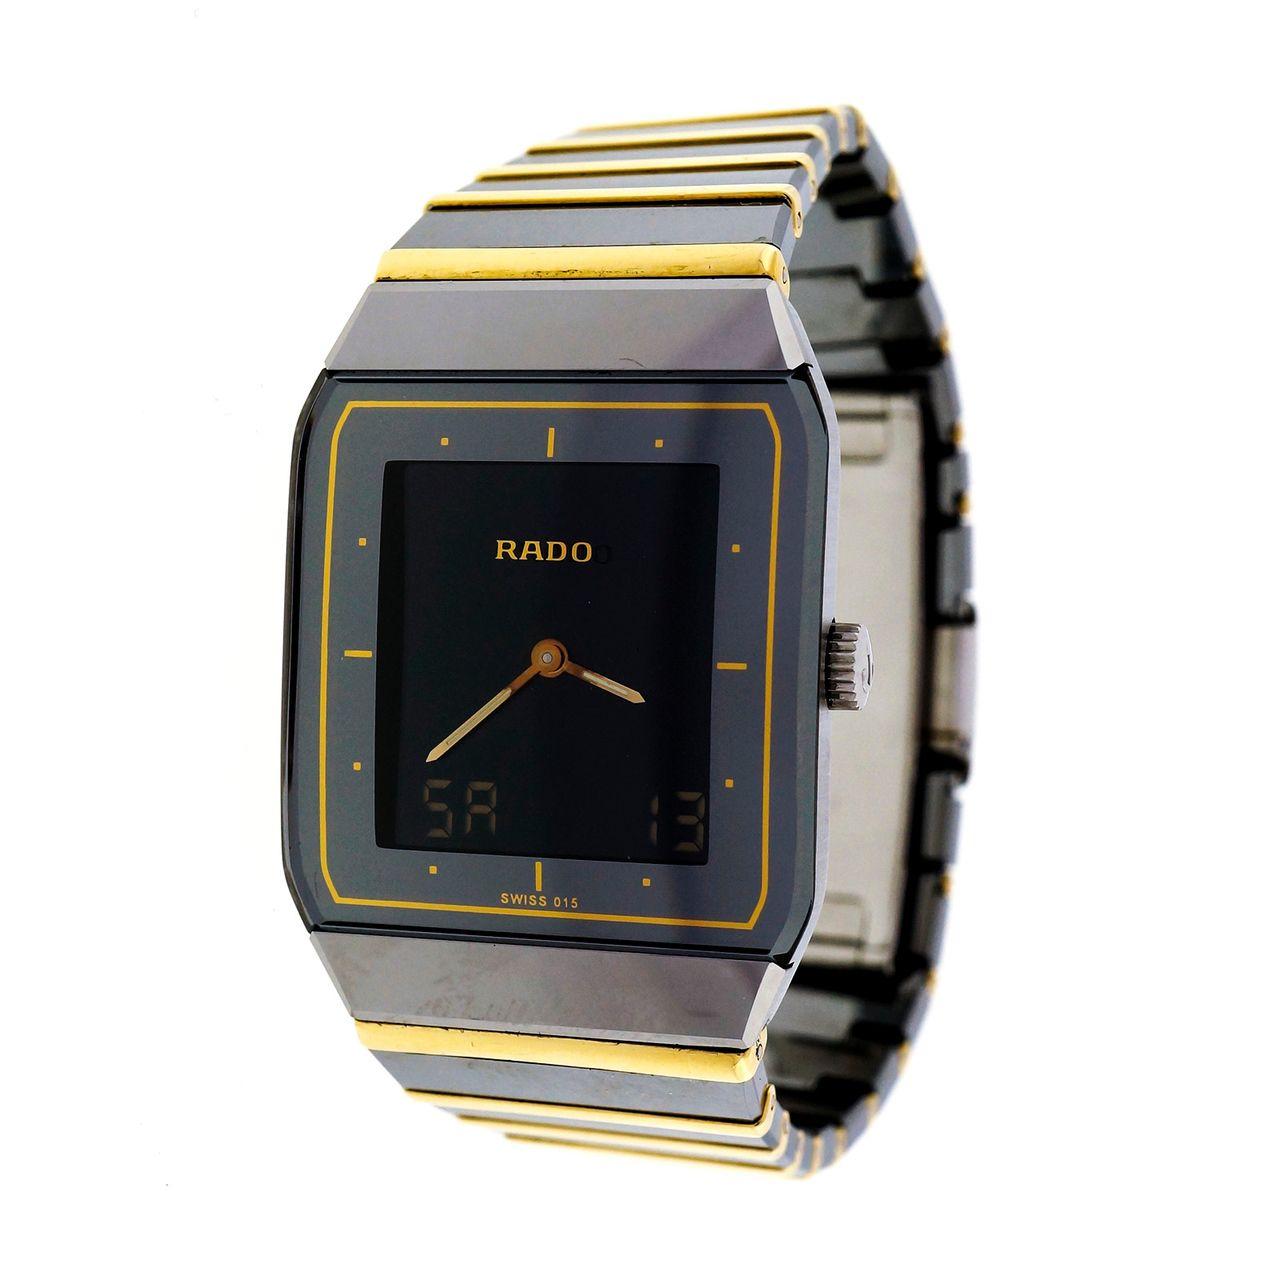 d2db9862d12 Men s Rado Diastar Ceramic 18k Analogue Digital Wrist Watch -  petersuchyjewelers